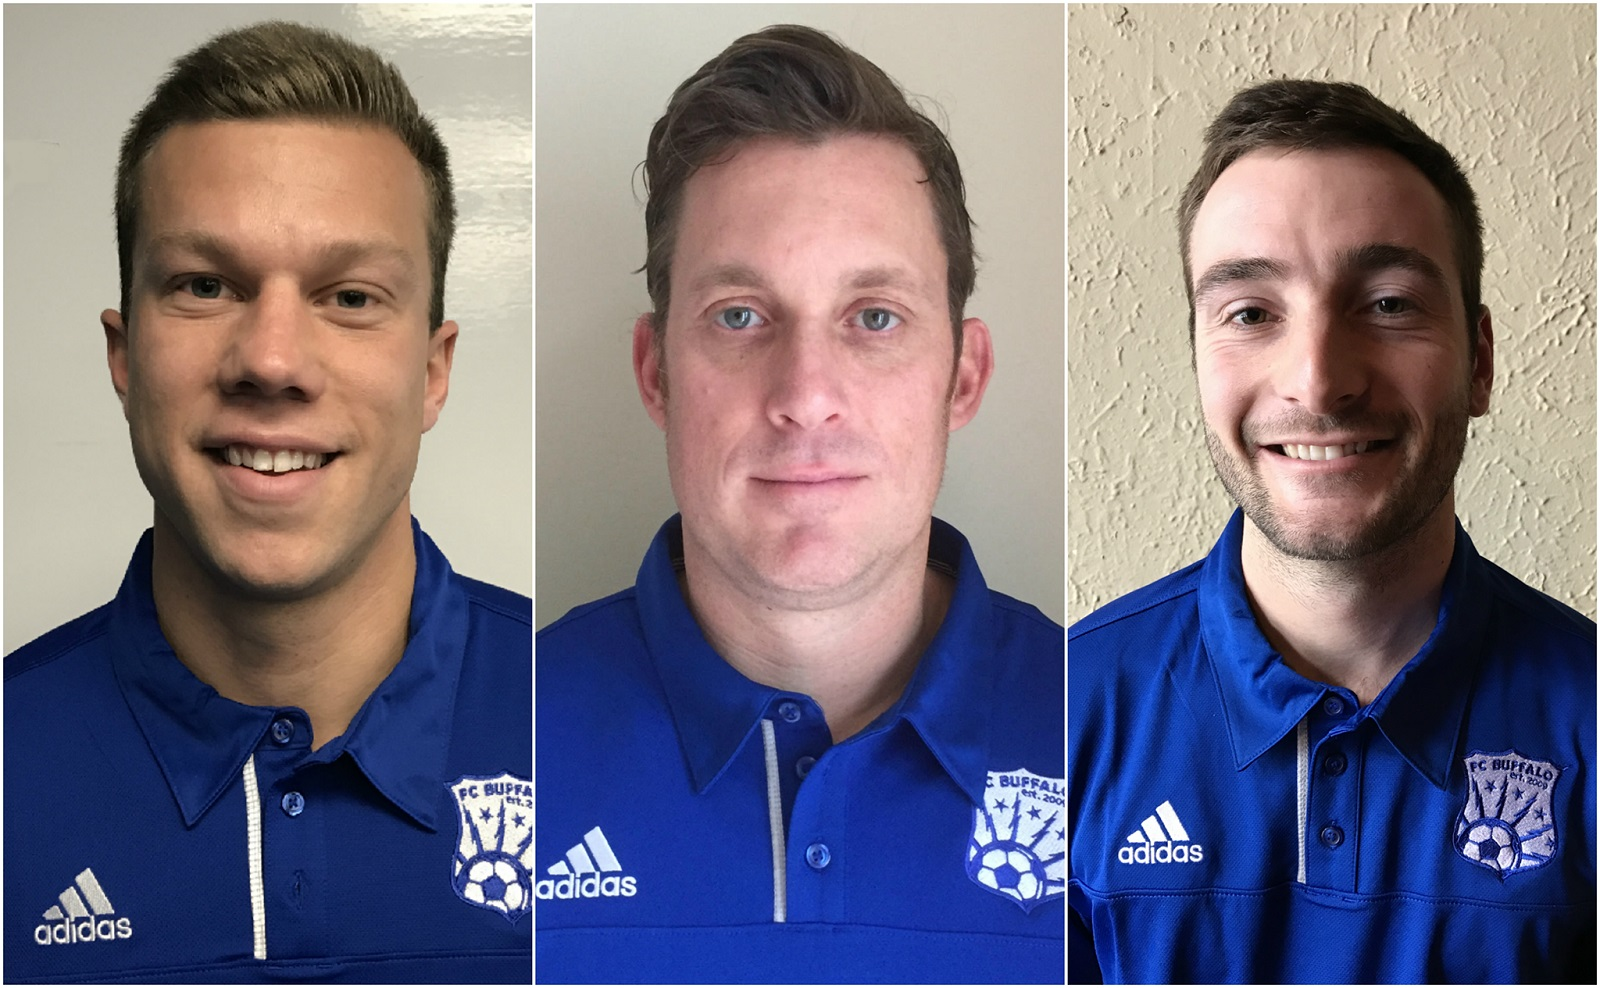 Frank Butcher, middle, is FC Buffalo's new head coach. Casey Derkacz, left, and John Grabowski, right, are his assistants. (via FC Buffalo)